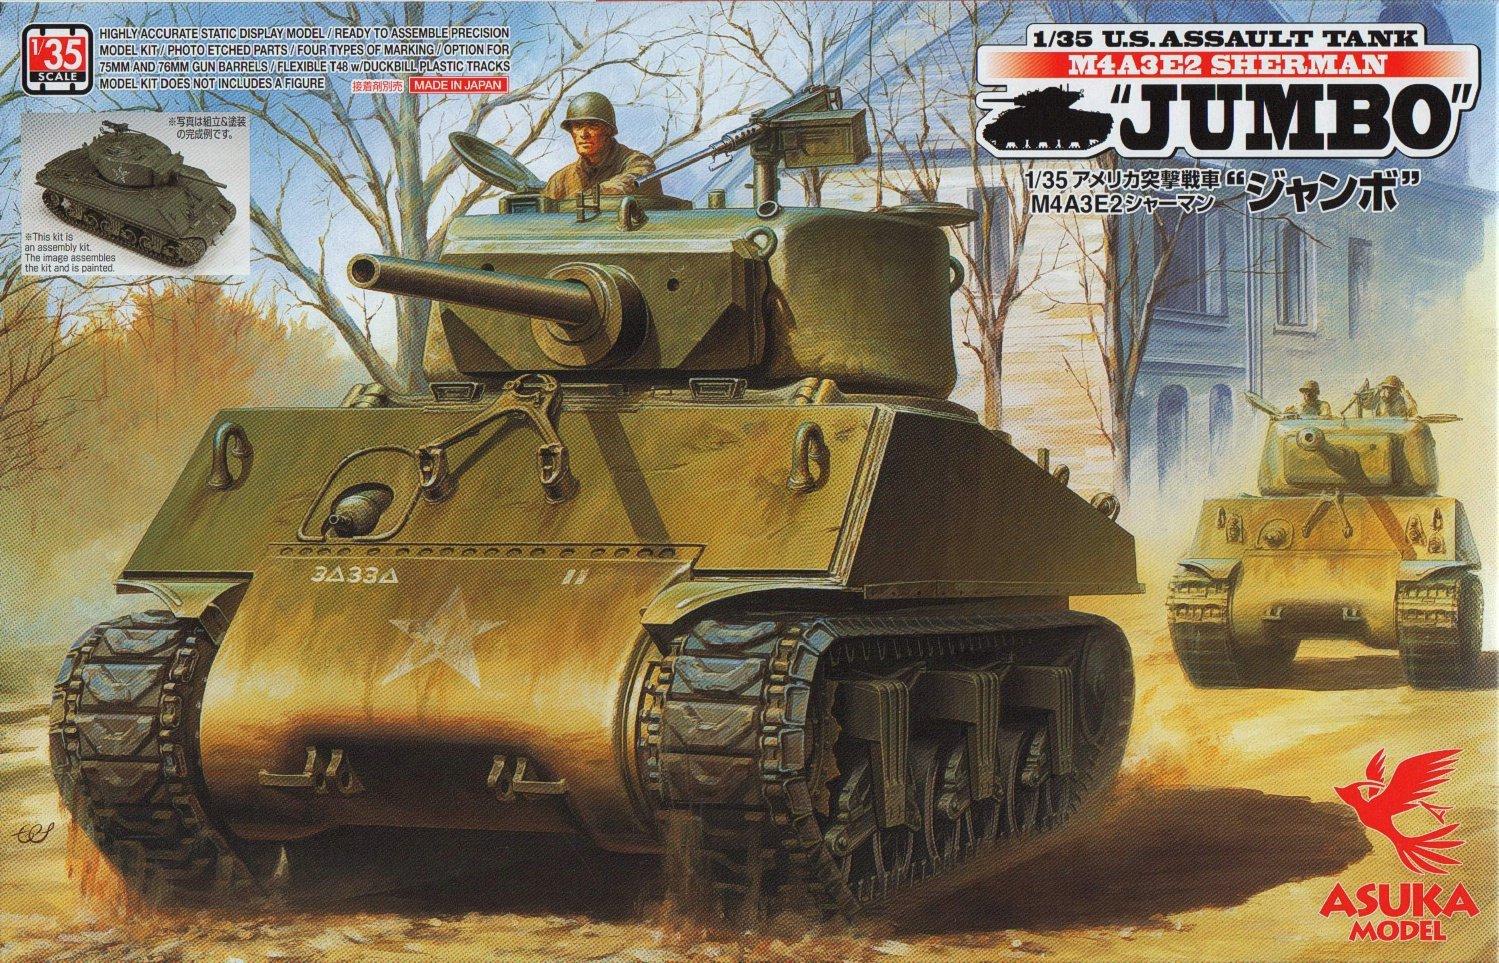 1/35 Scale U.S Assault Tank M4A3E2 Sherman